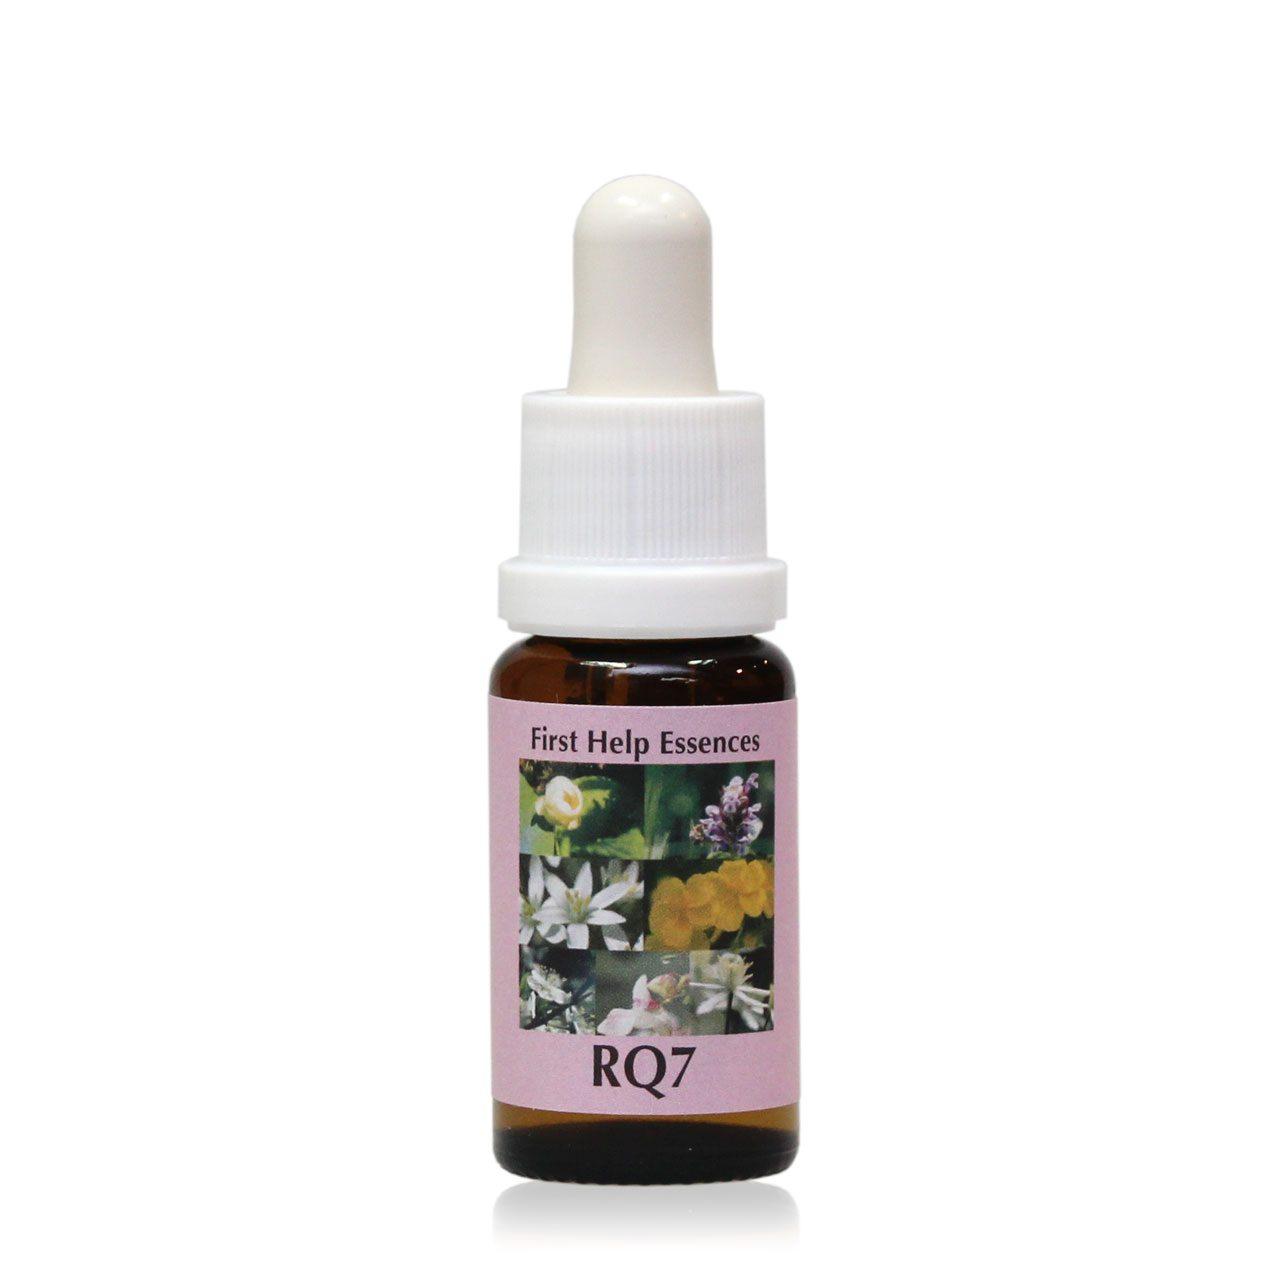 RQ7 Notfallkombination 15 ml